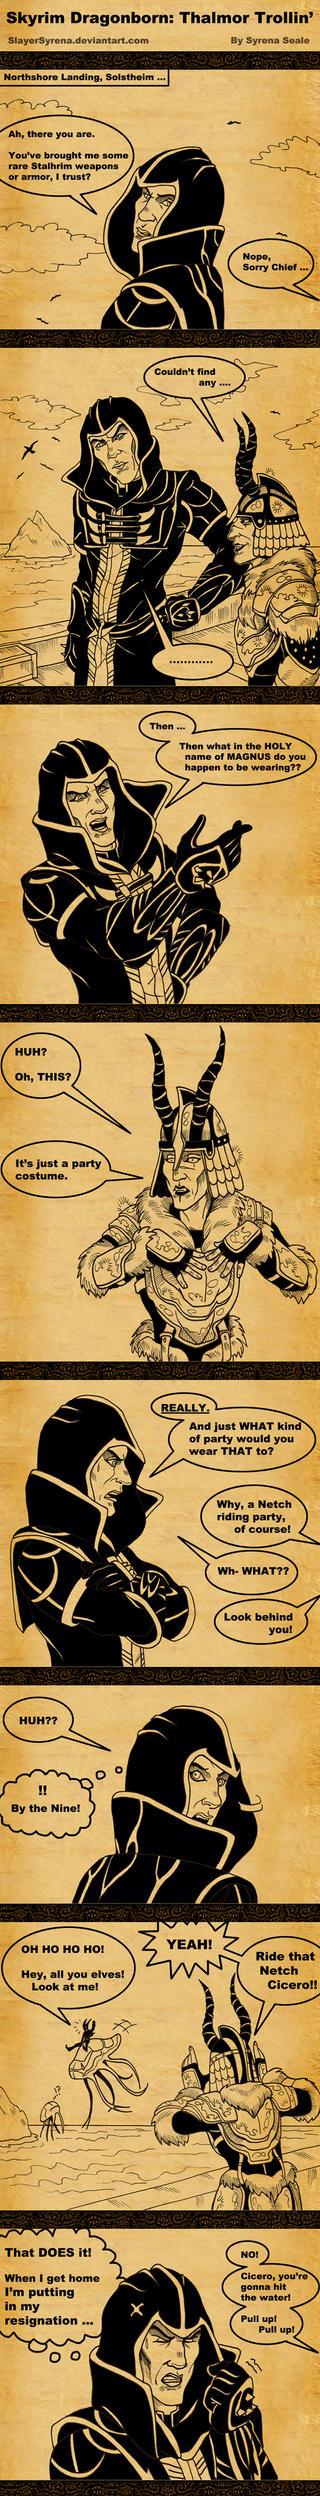 Skyrim Dragonborn Thalmor Trollin' by SlayerSyrena